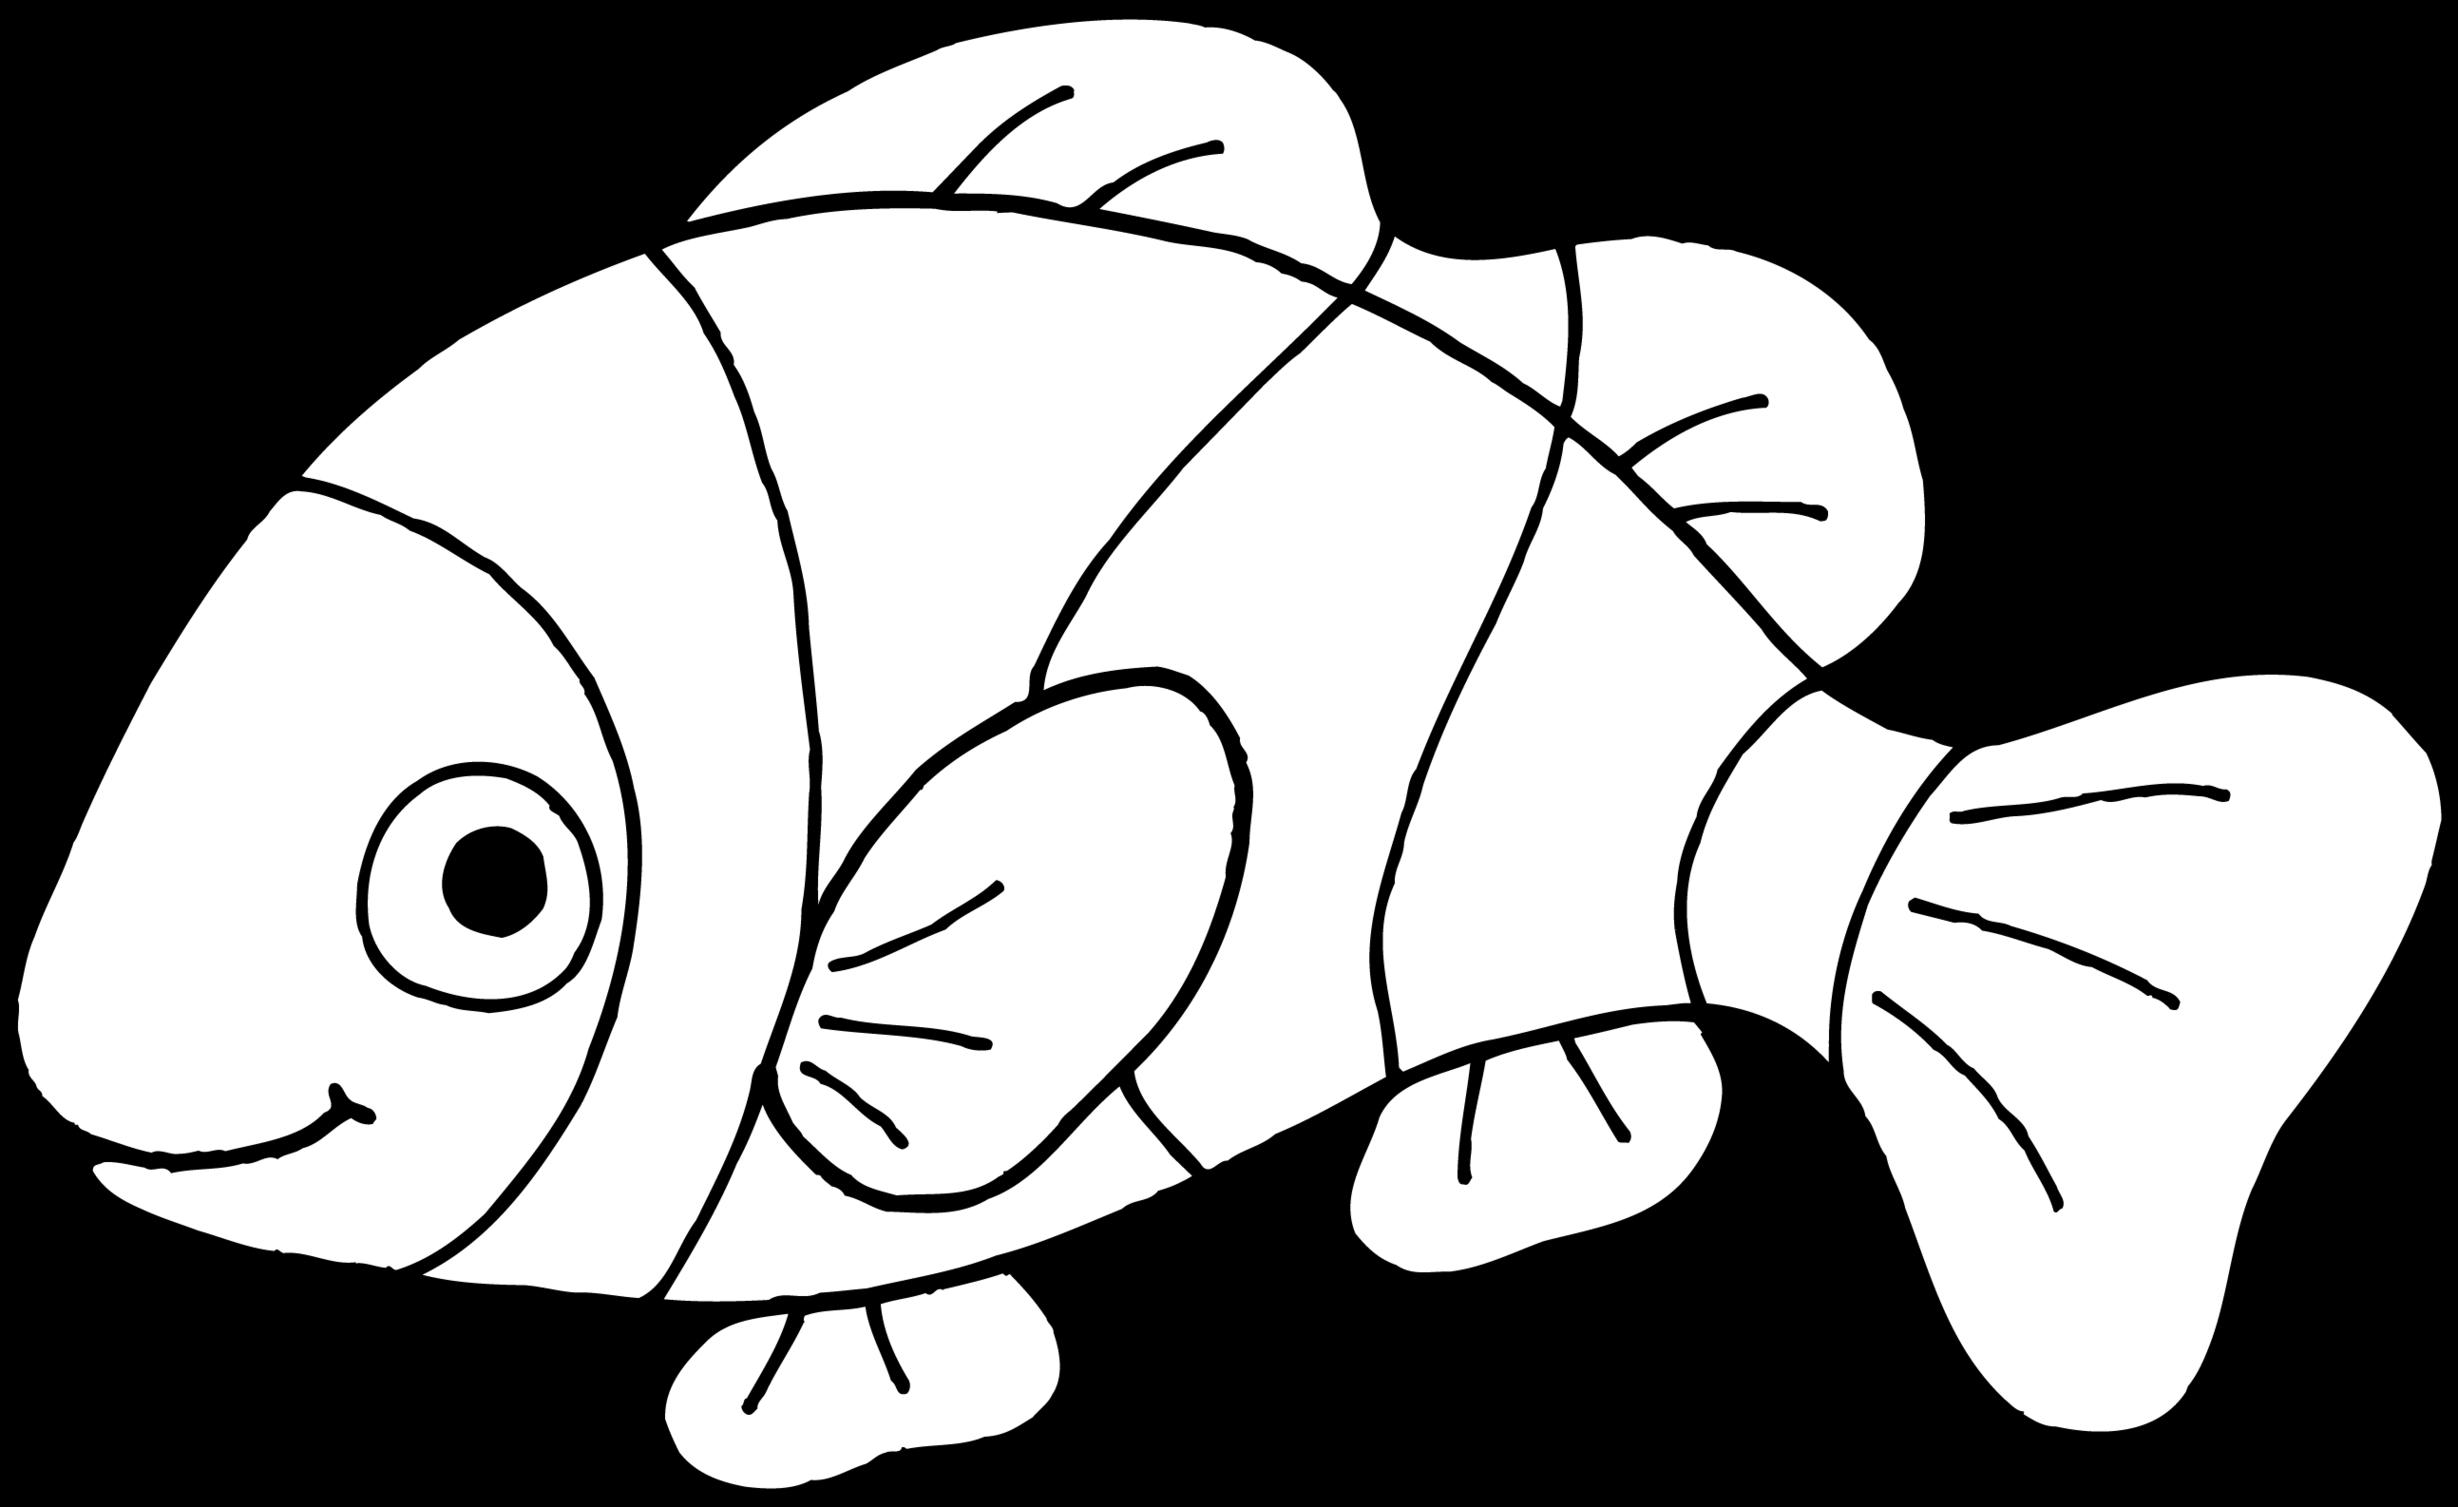 2458x1507 Fish Head Clipart Fish Head Cliparts, Stock Vector And Royalty